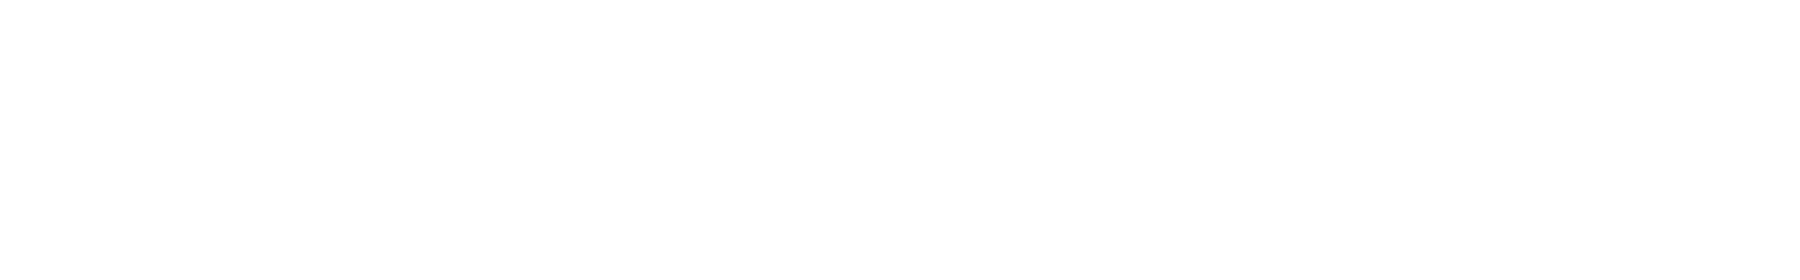 vedh synth cut 213 f